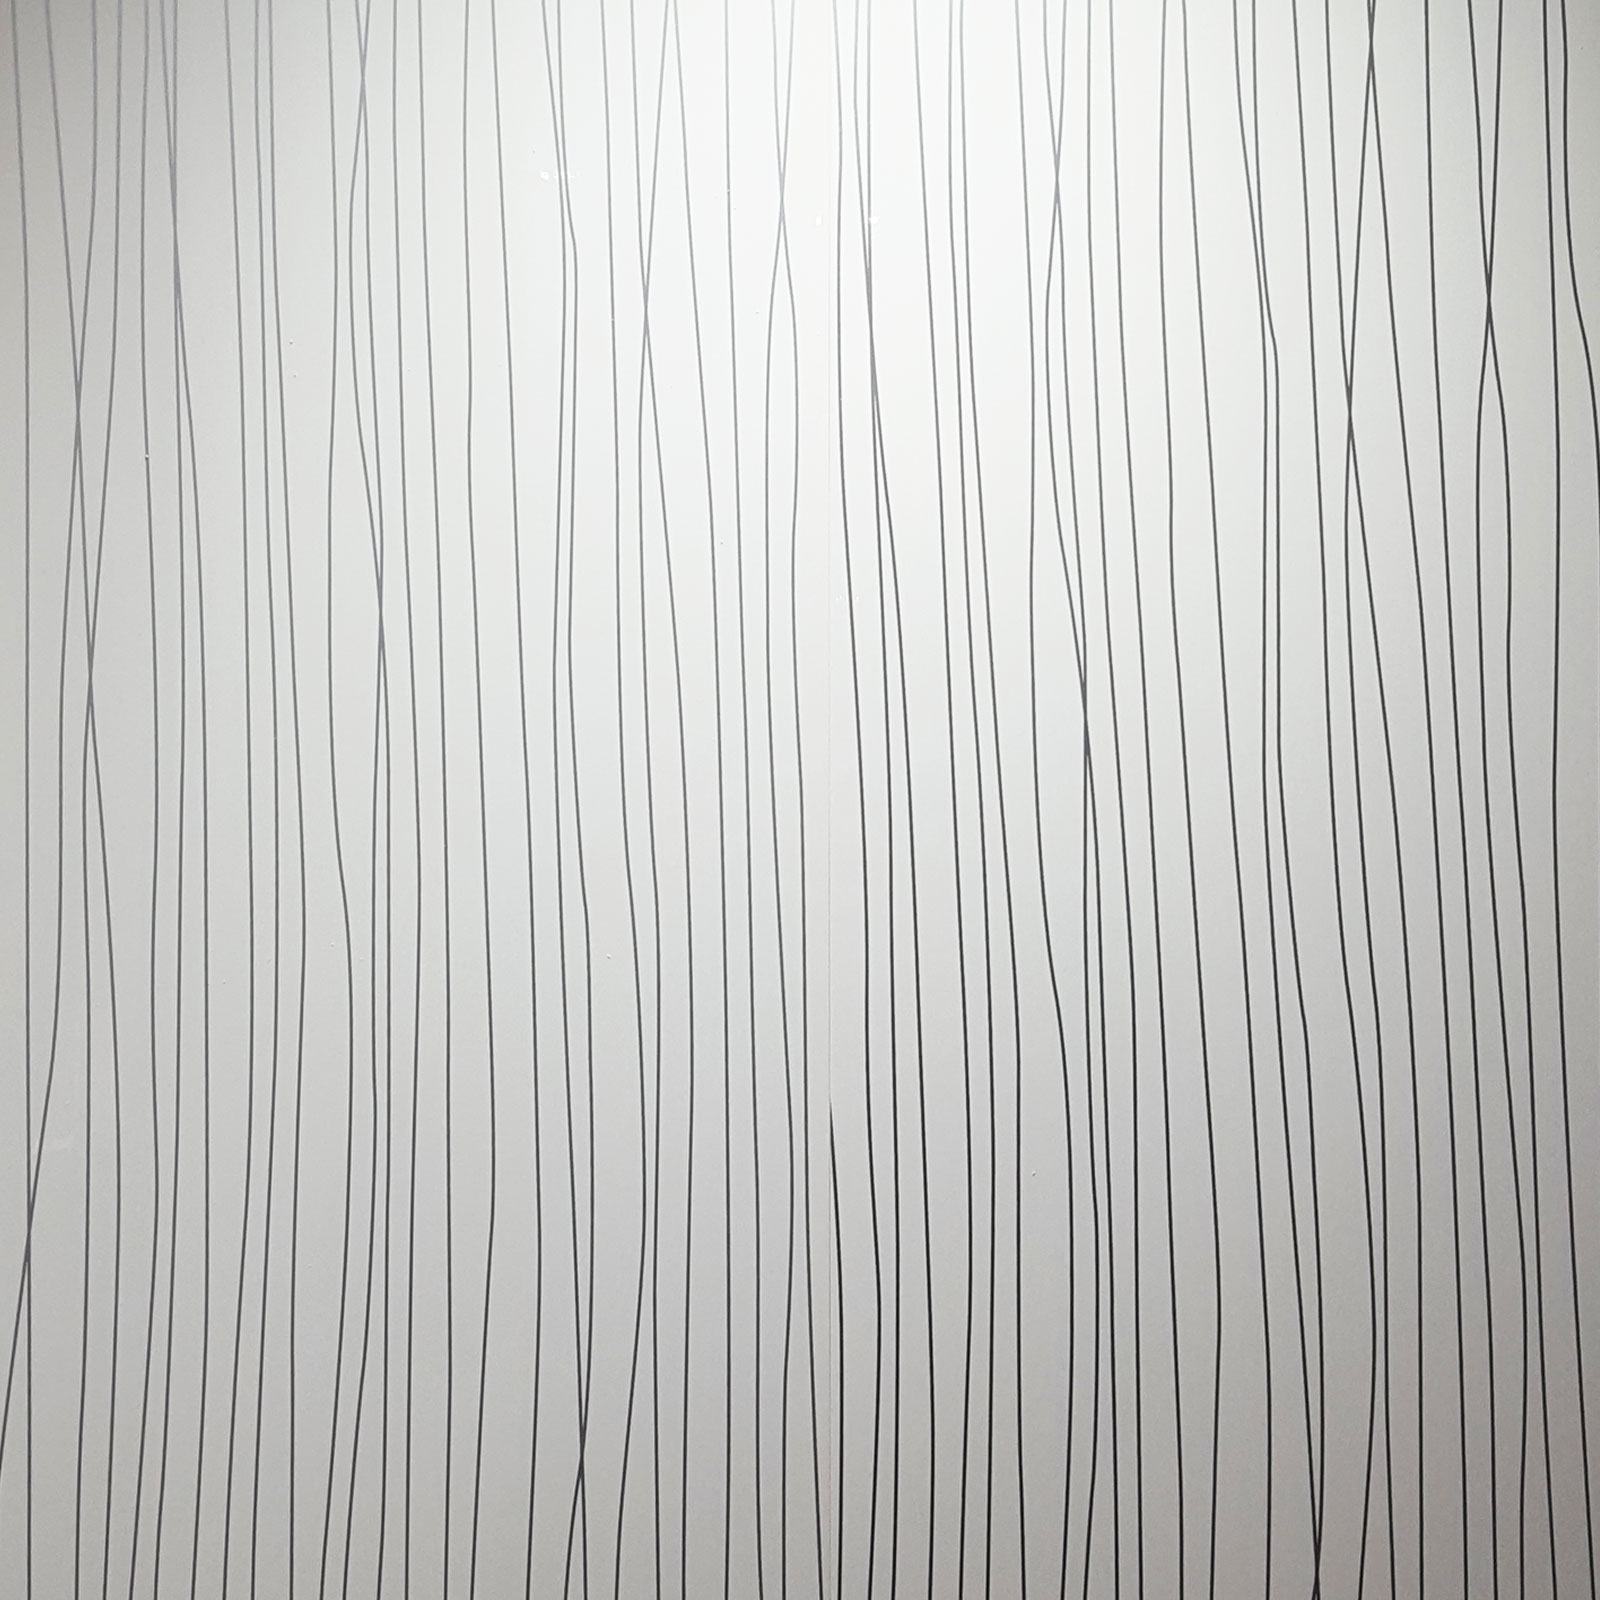 Silver Strings White Bathroom Cladding Store